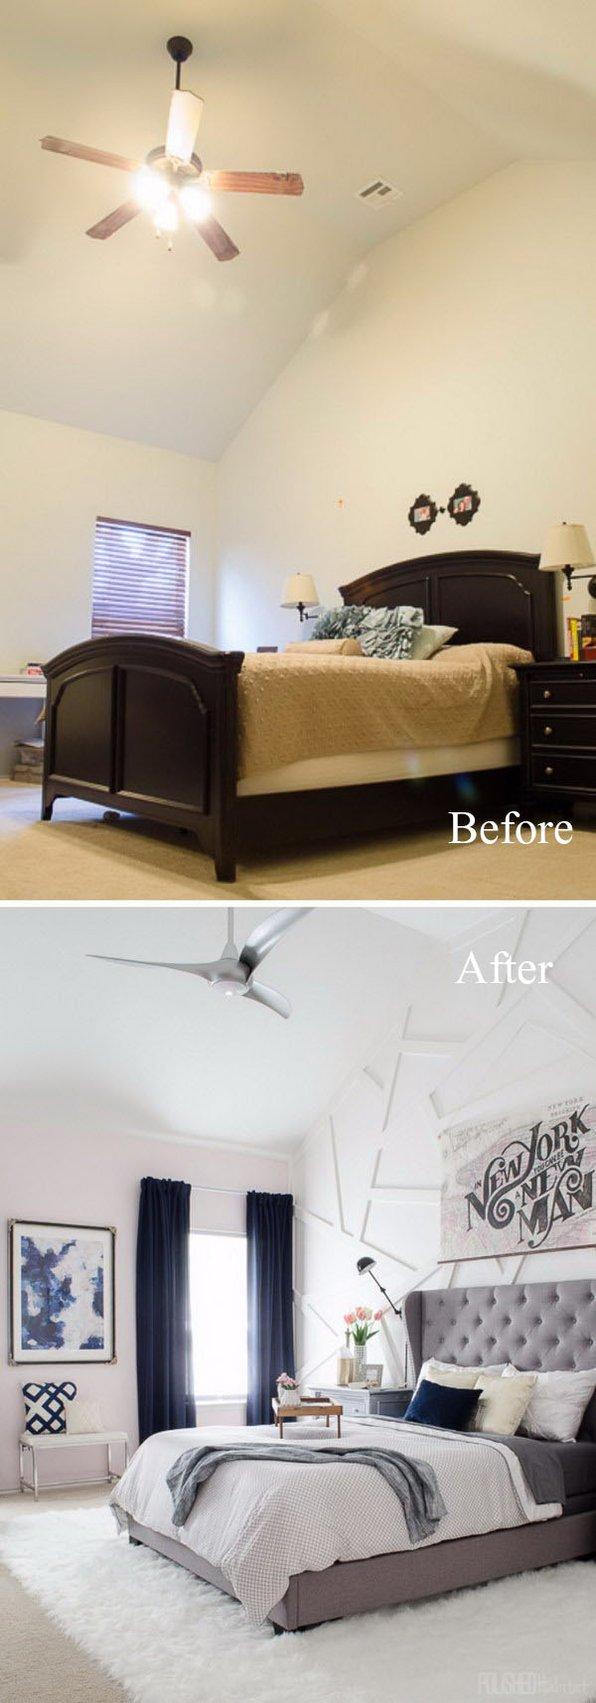 30-31-great-ways-to-make-your-small-bedroom-look-bigger.jpg